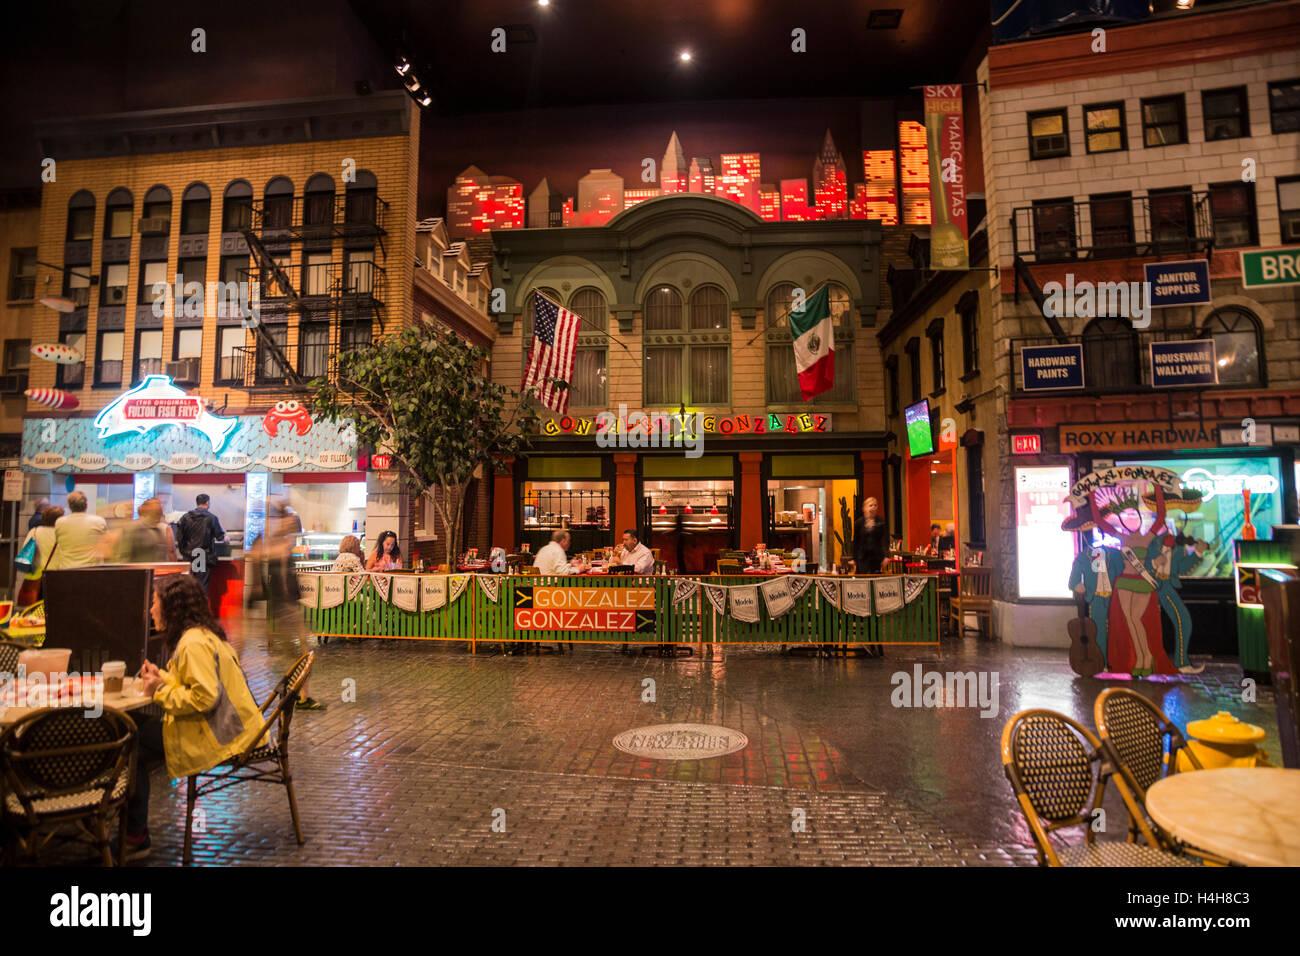 New York New York Street And Italian Restaurant In Las Vegas